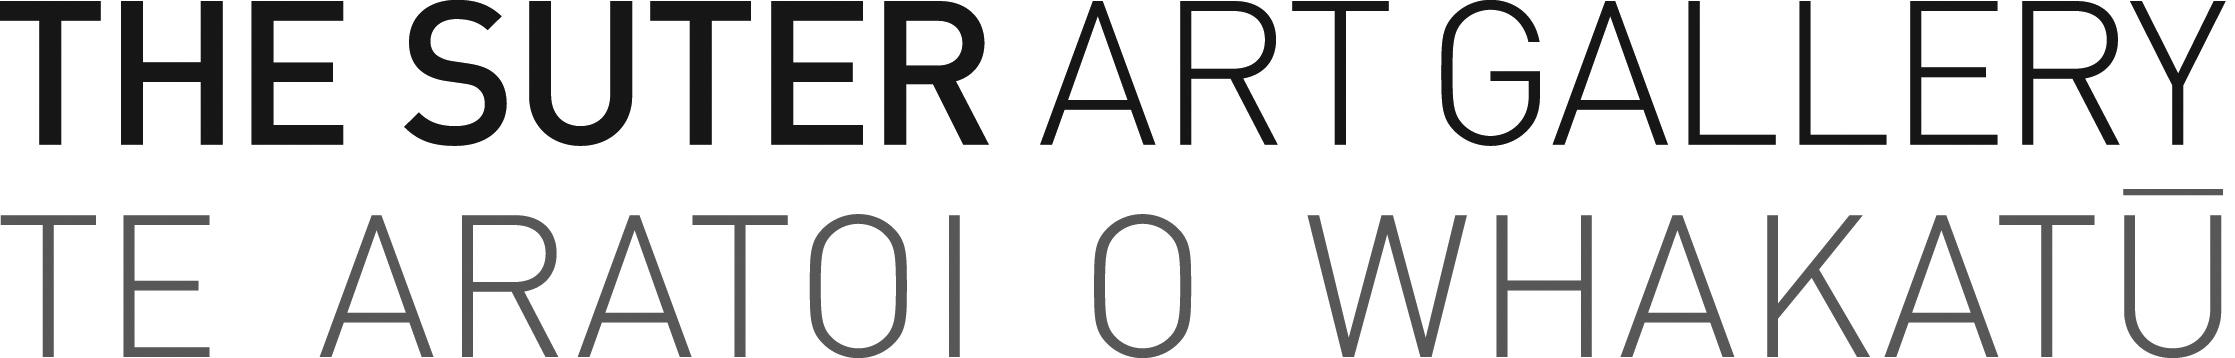 The Suter Art Gallery